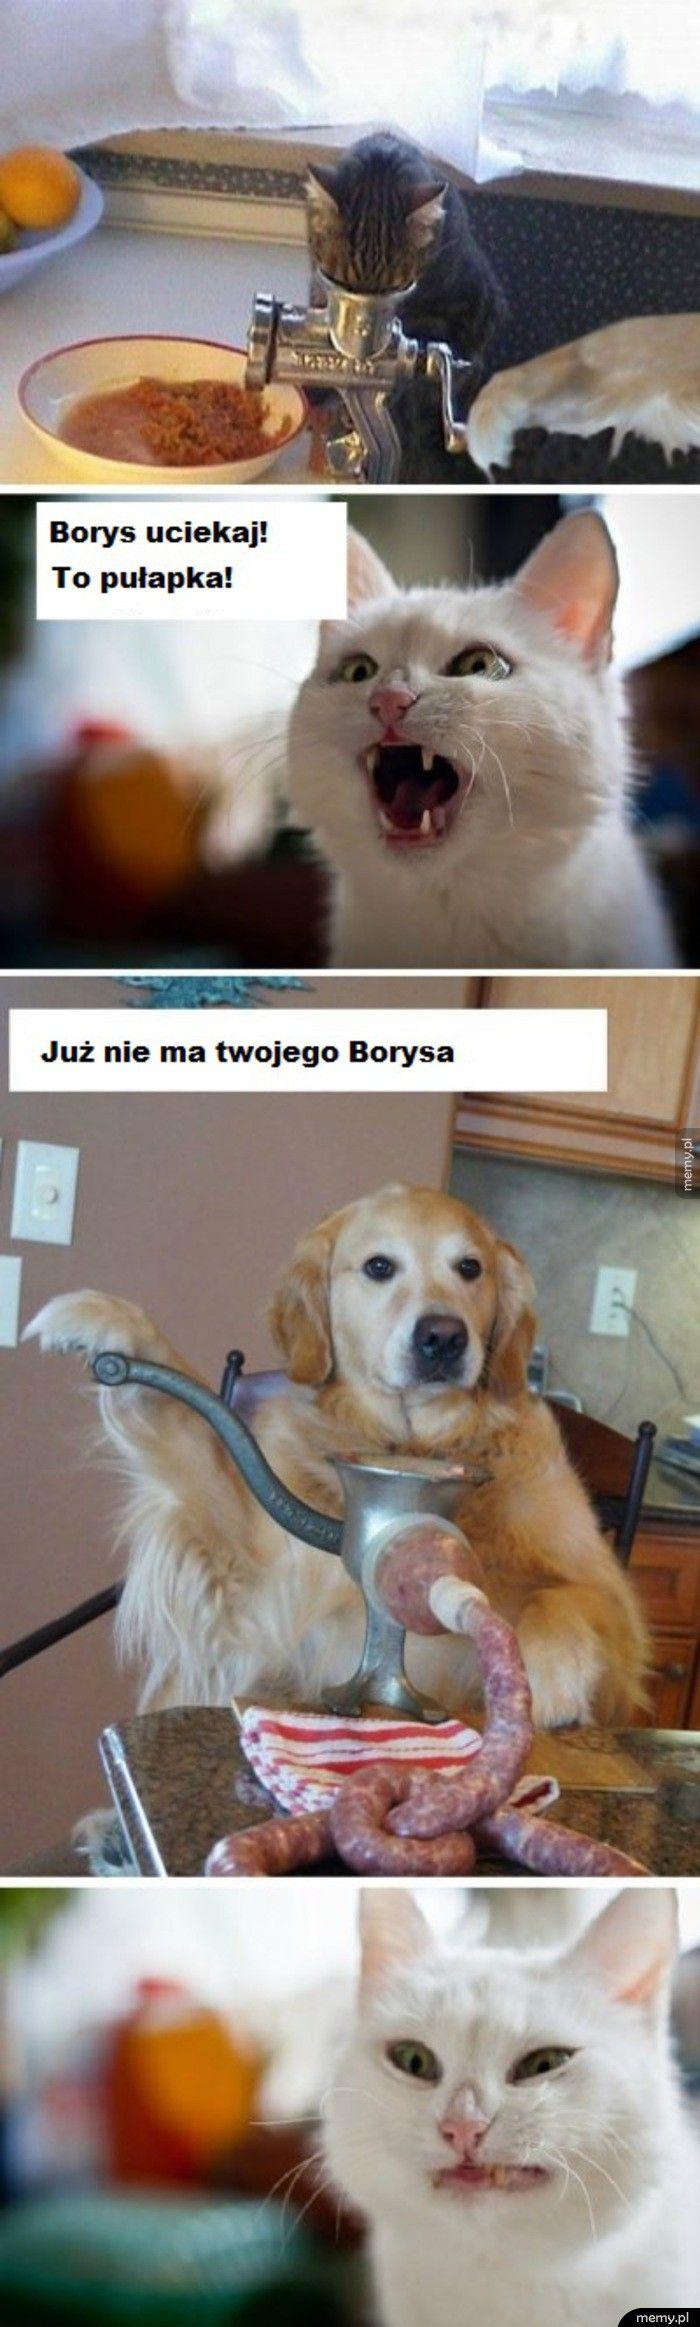 Biedny Borys